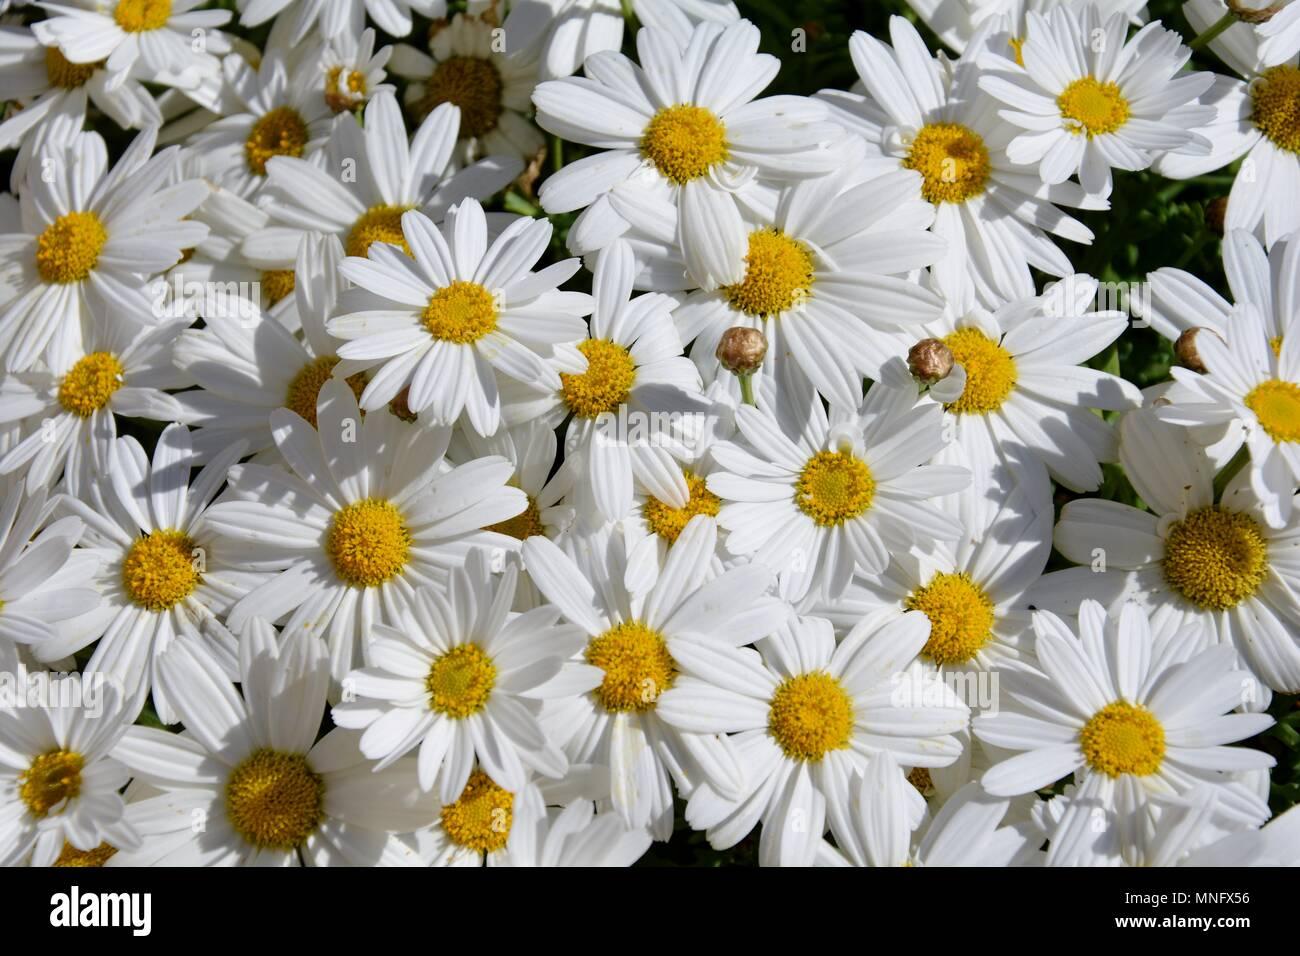 Field of daisies field flower flowers daisy daisies white field of daisies field flower flowers daisy daisies white yellow petals petal nature plant izmirmasajfo